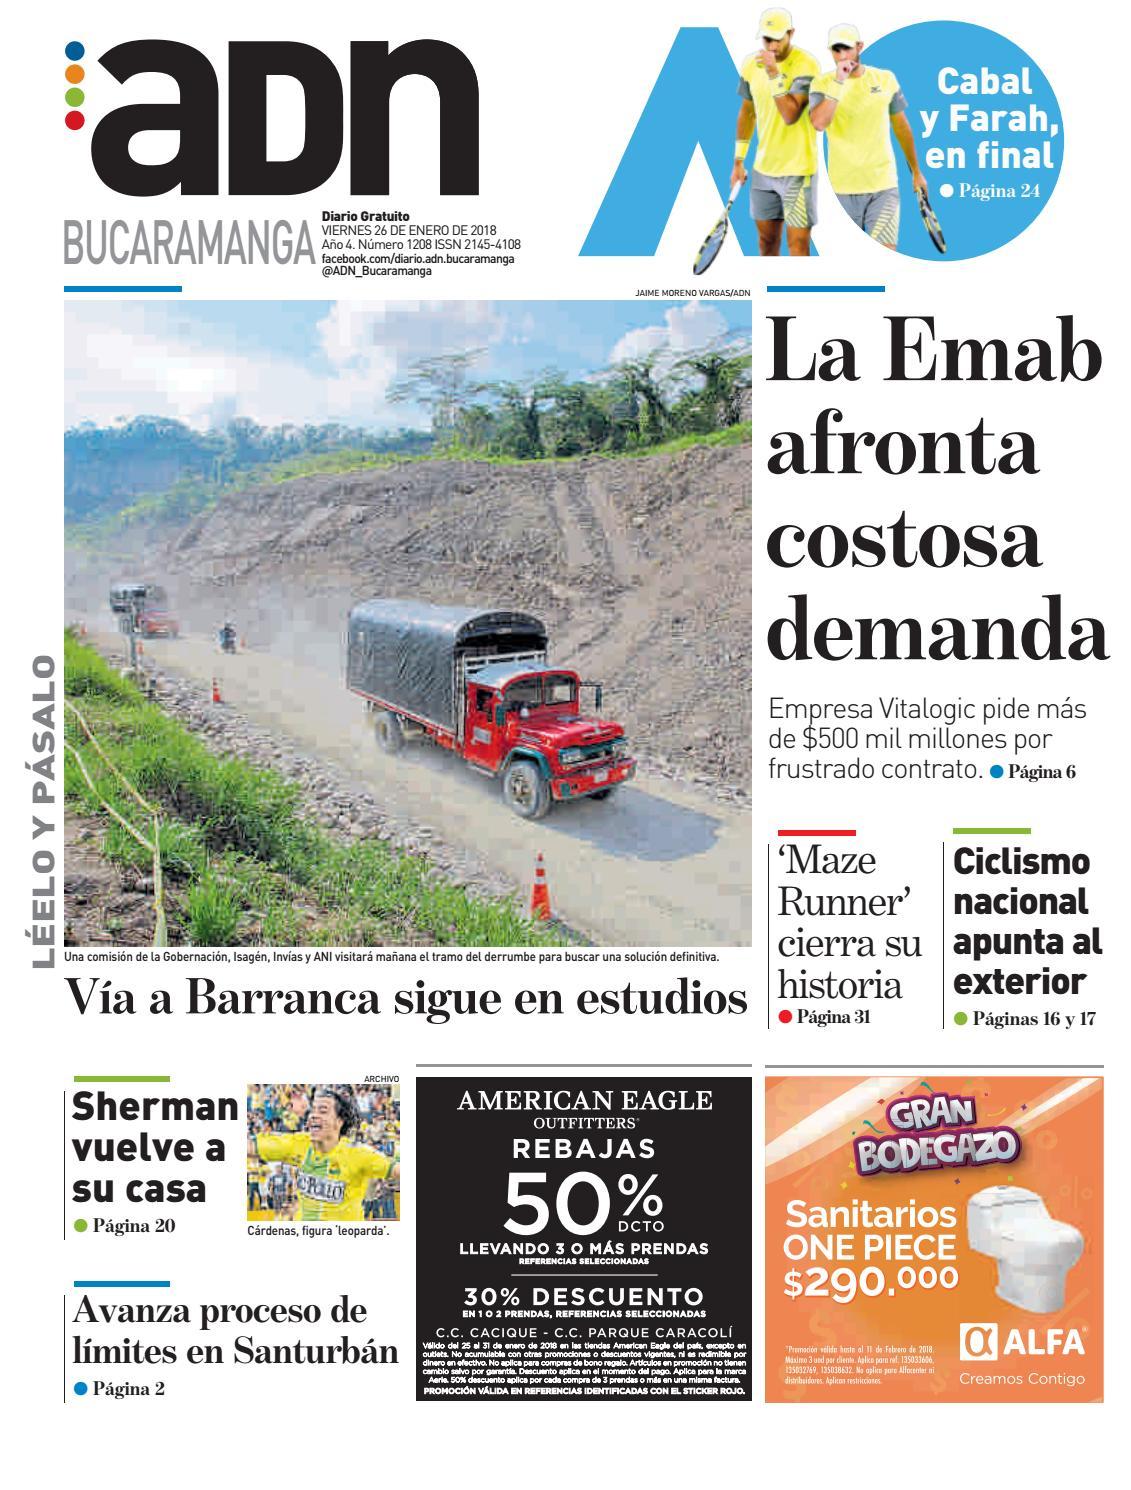 ADN Bucaramanga del 26 de enero del 2018 by diarioadn.co - issuu